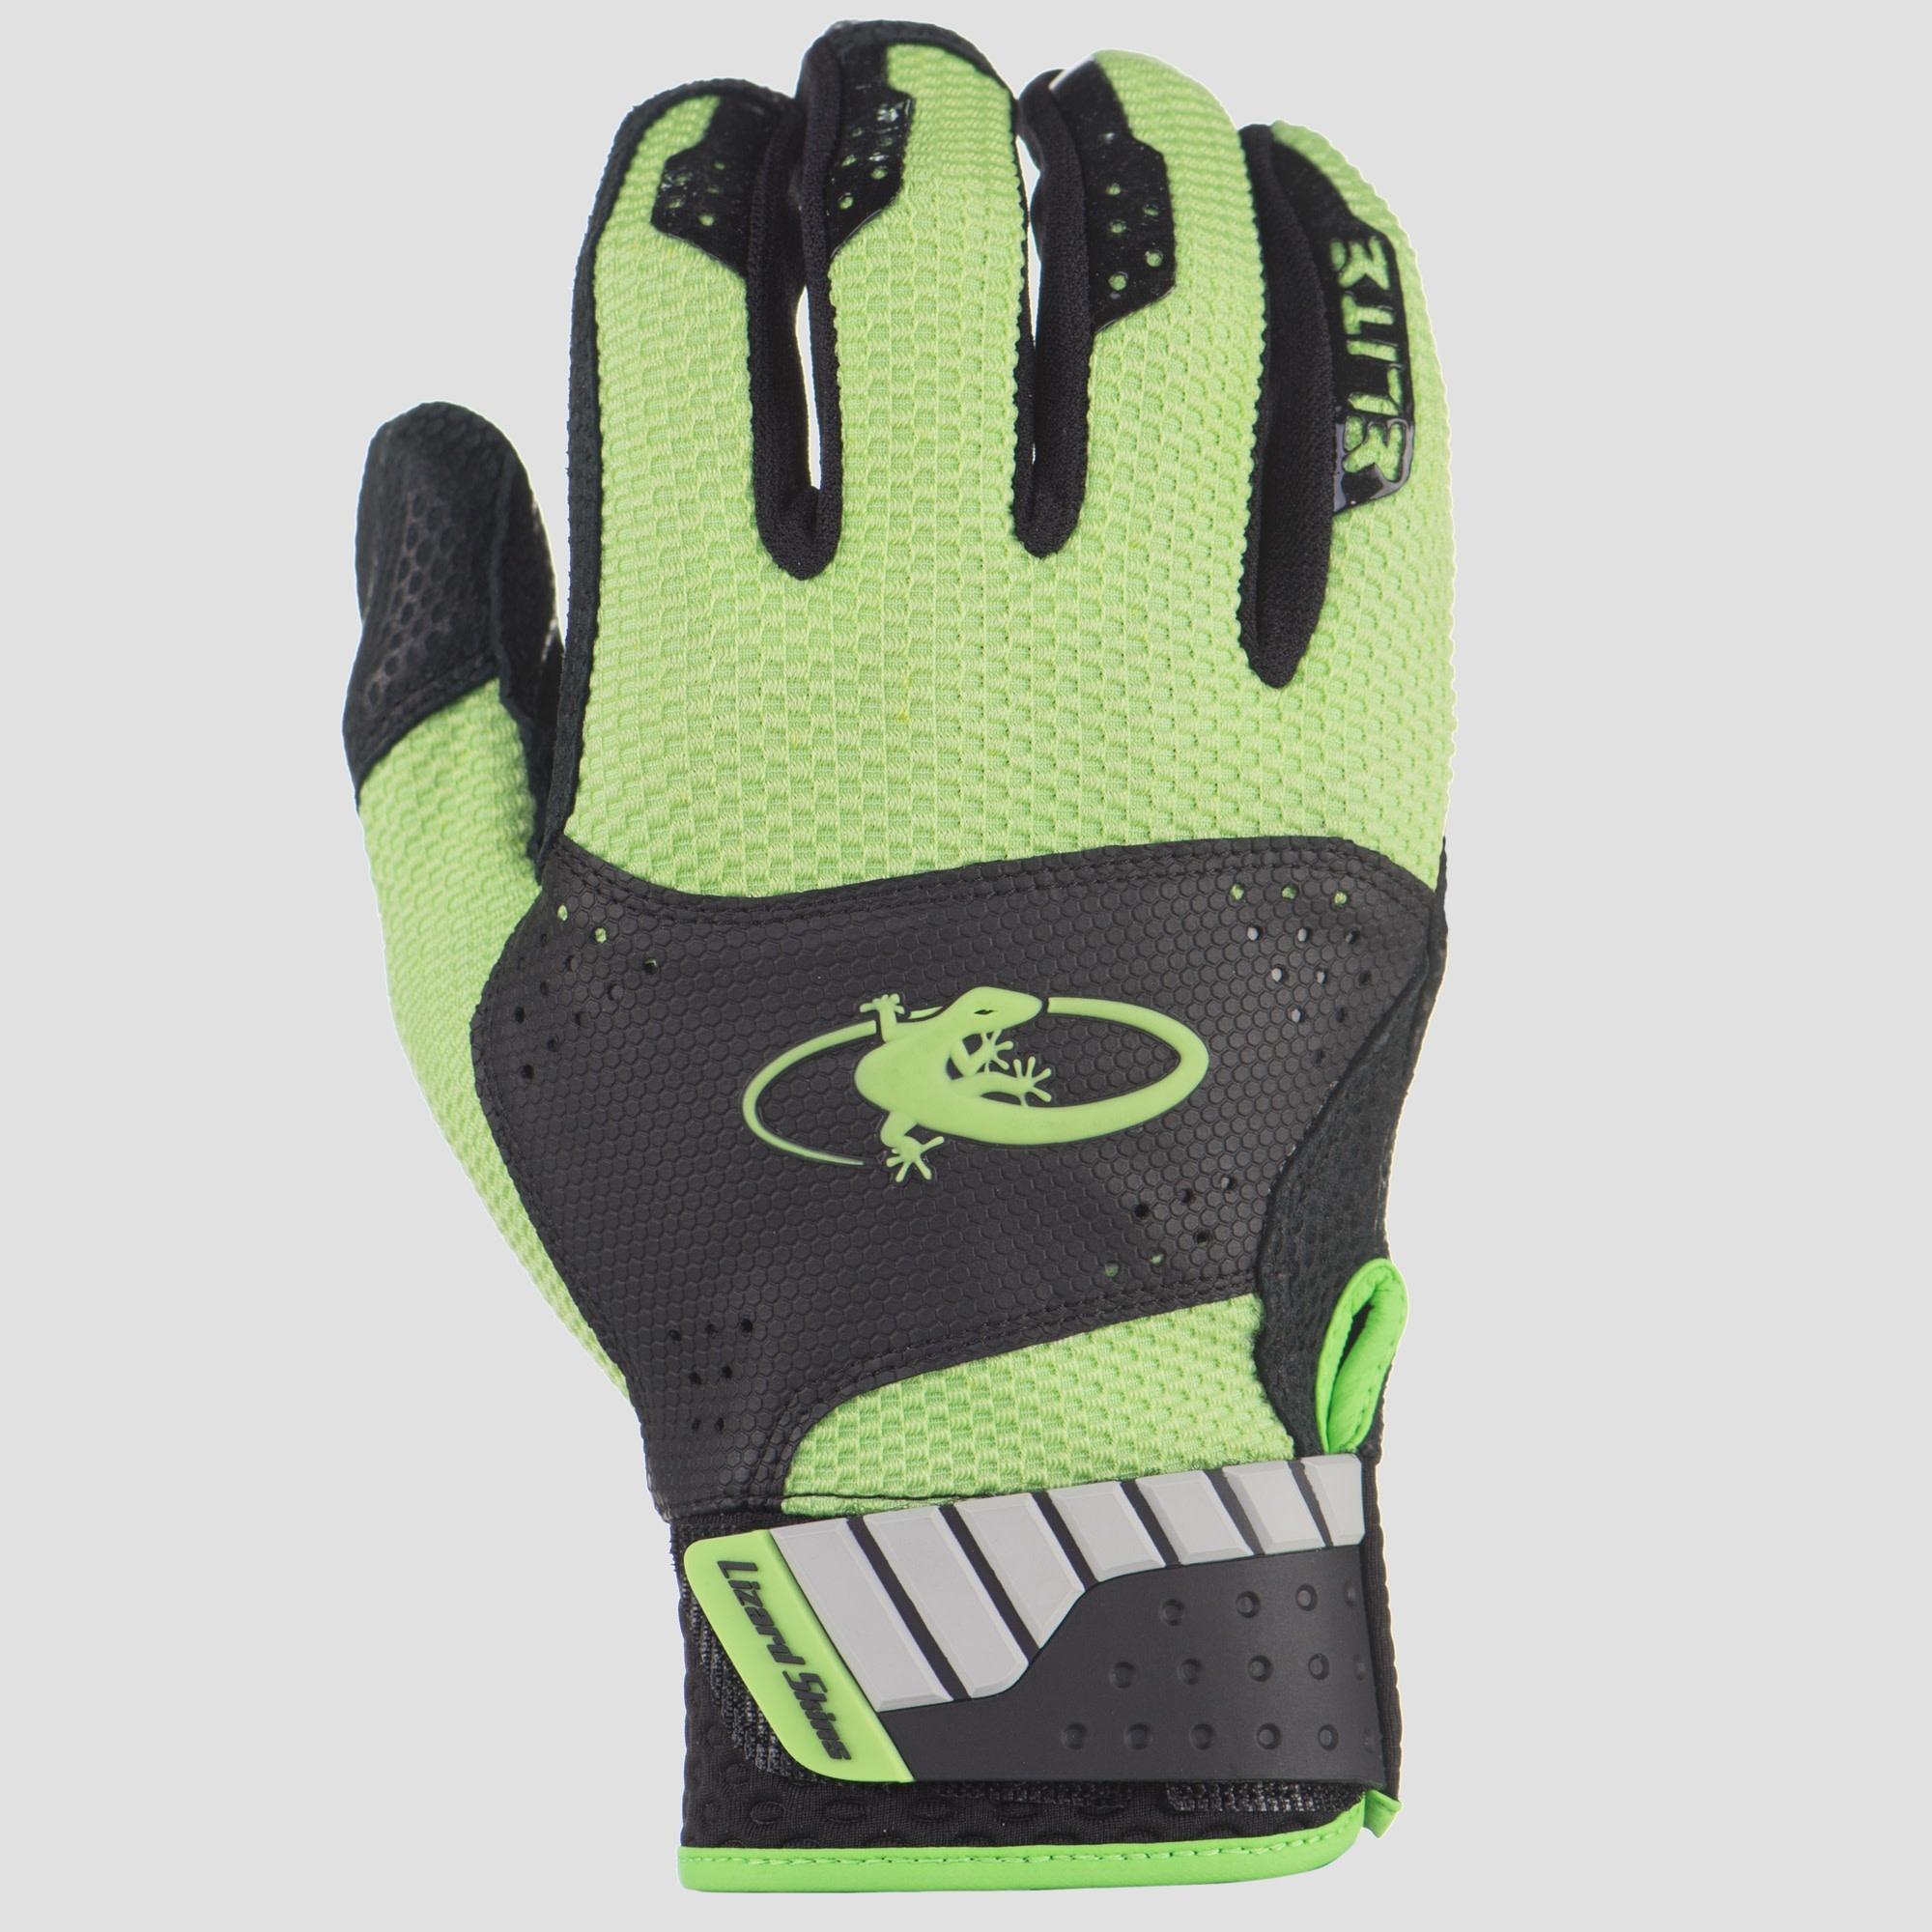 Lizard Skin Komodo Elite Batting Glove -